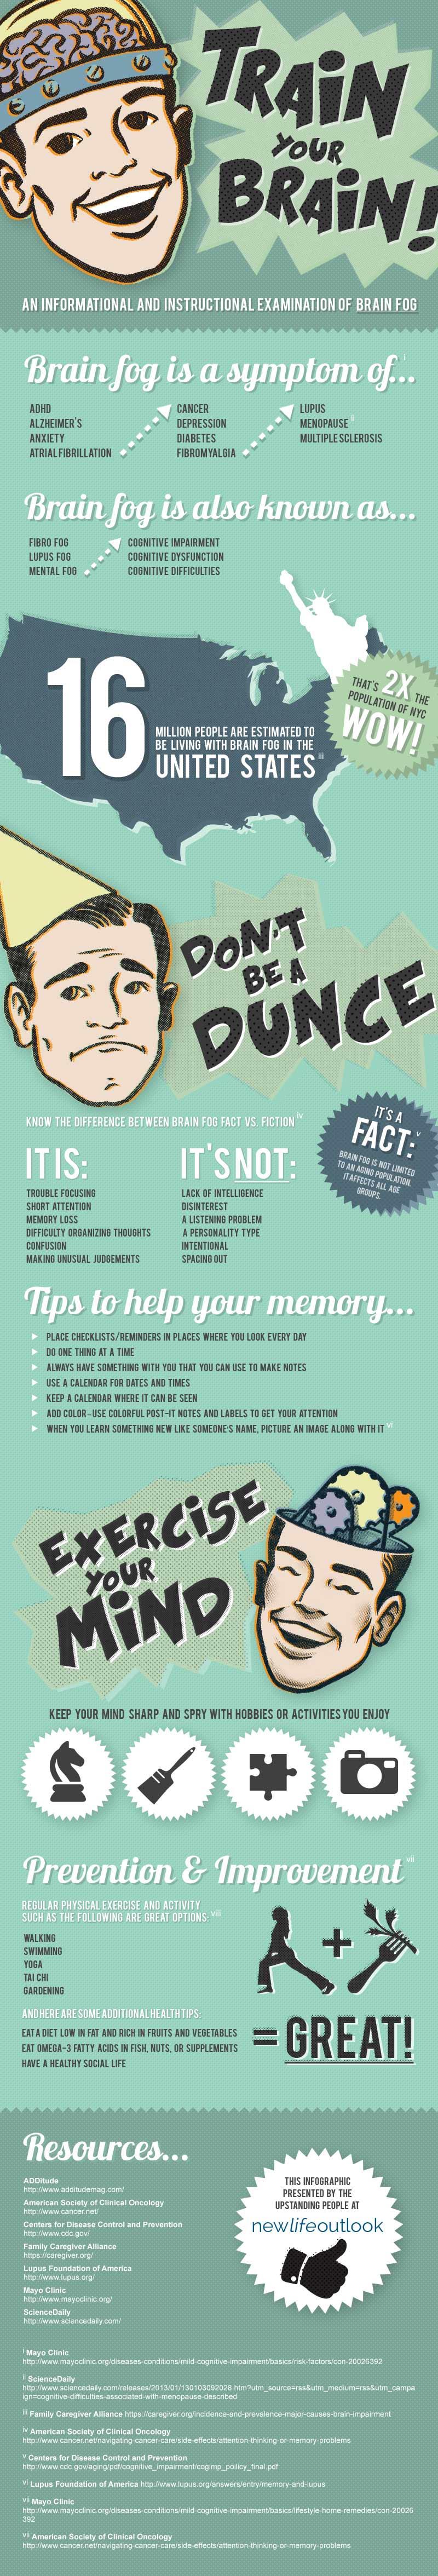 Train Your Brain - Brain Fog